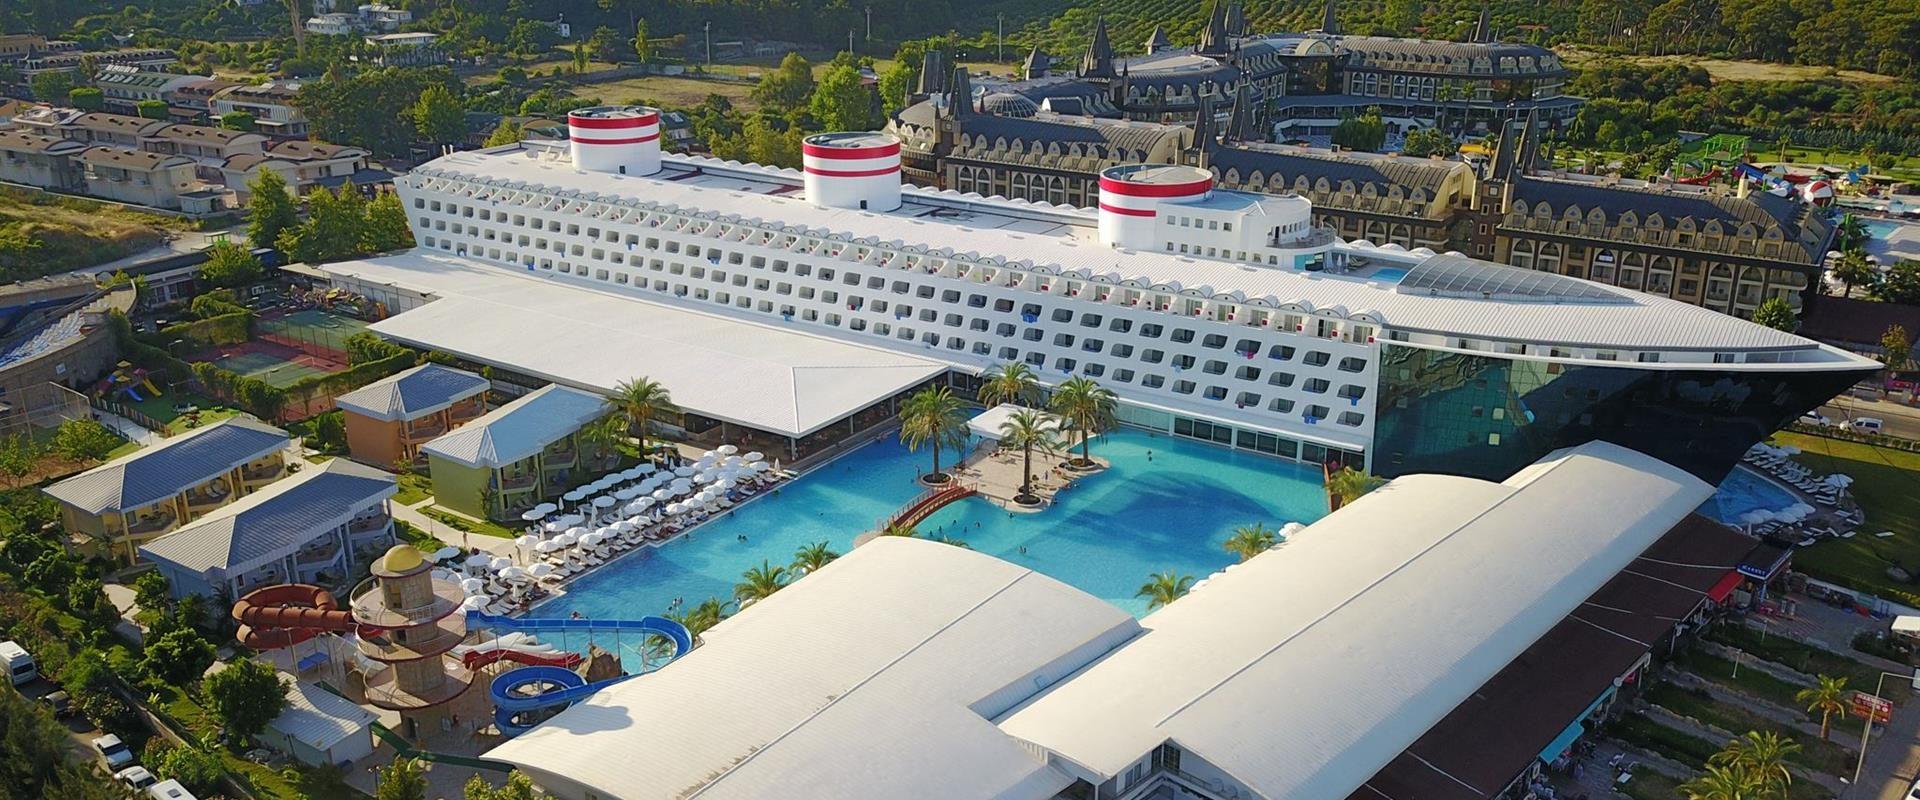 Sejur în Turcia, Kemer, Transatlantik Hotel & Spa